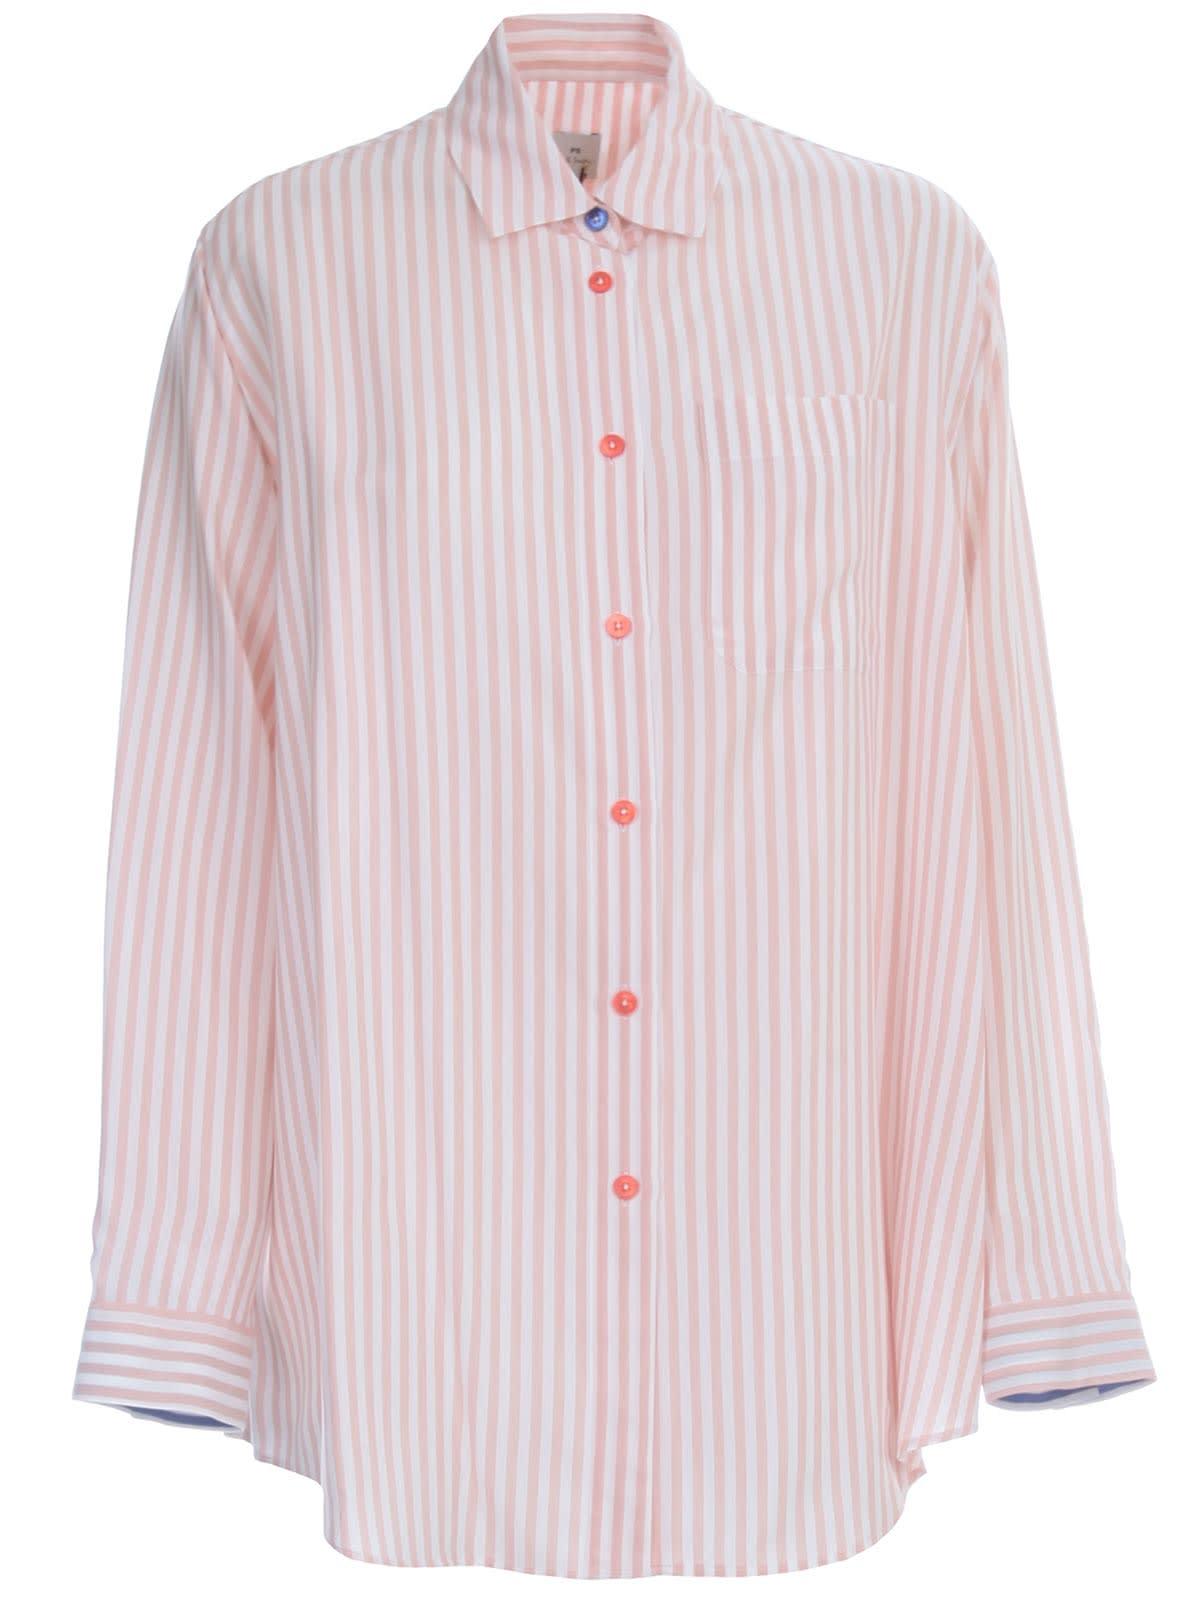 Paul Smith Shirt Over W/pocket